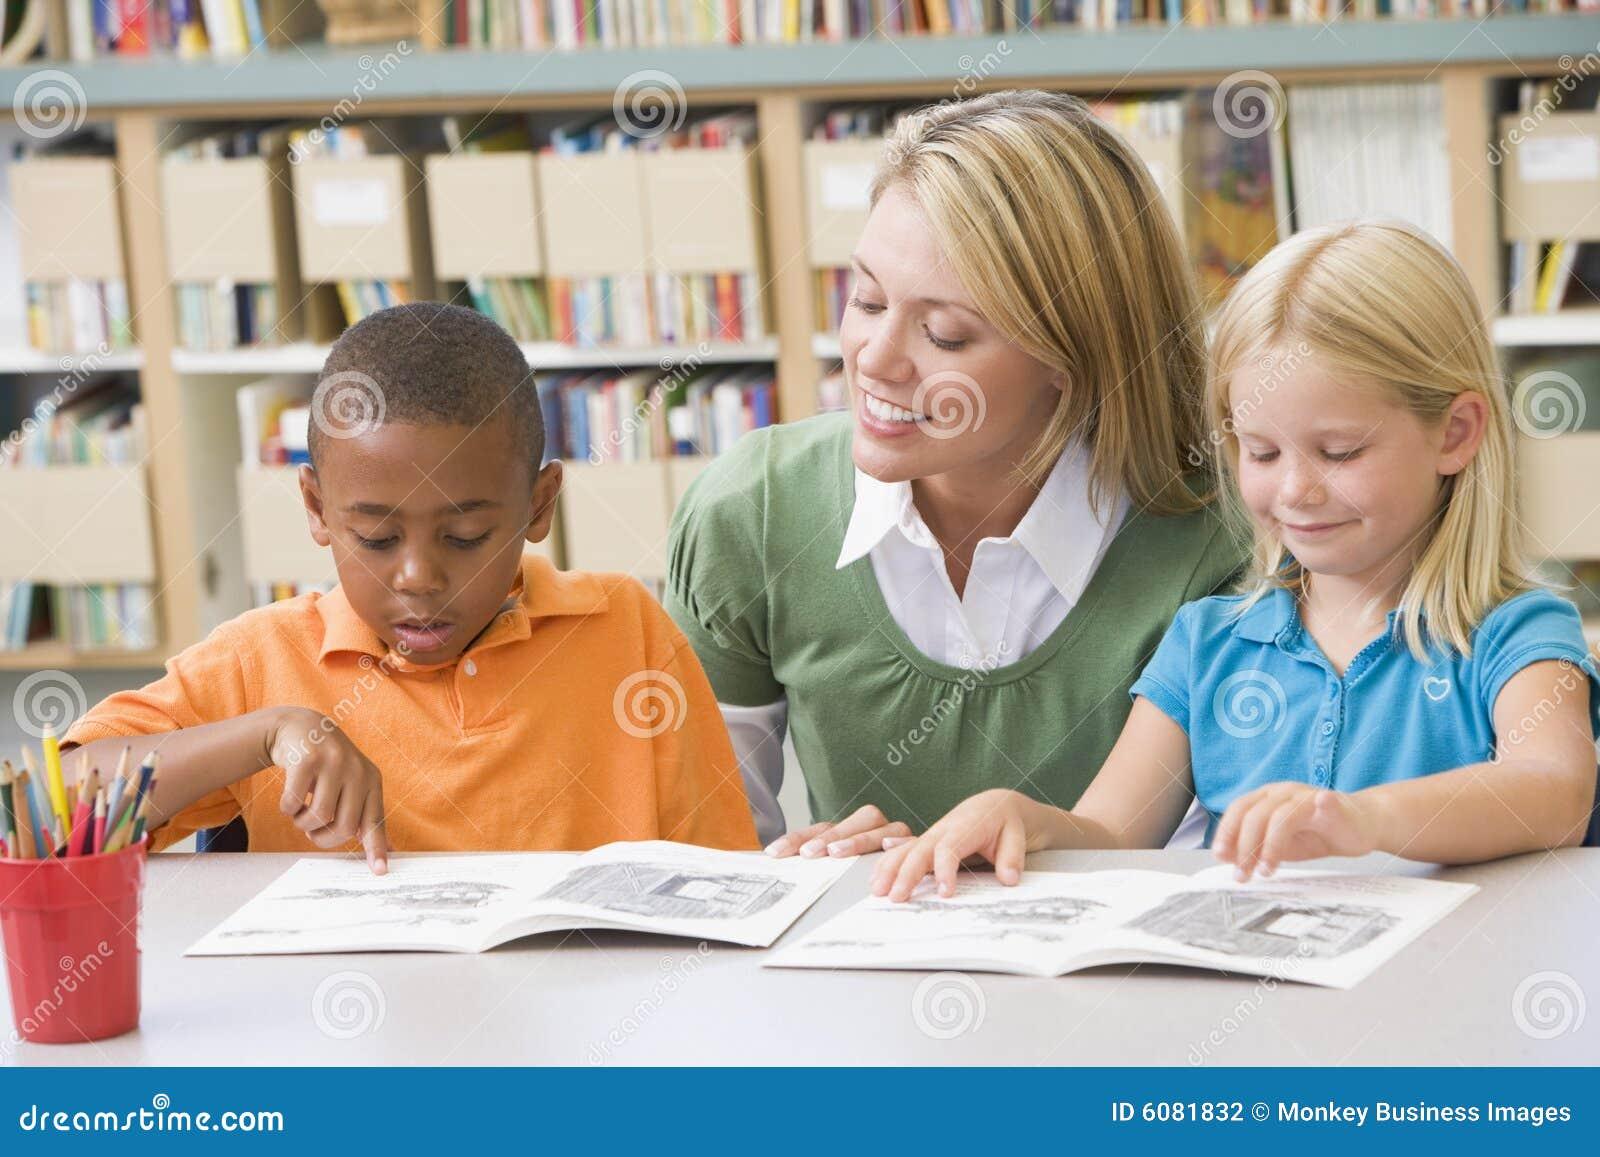 de habilidades de lectura: